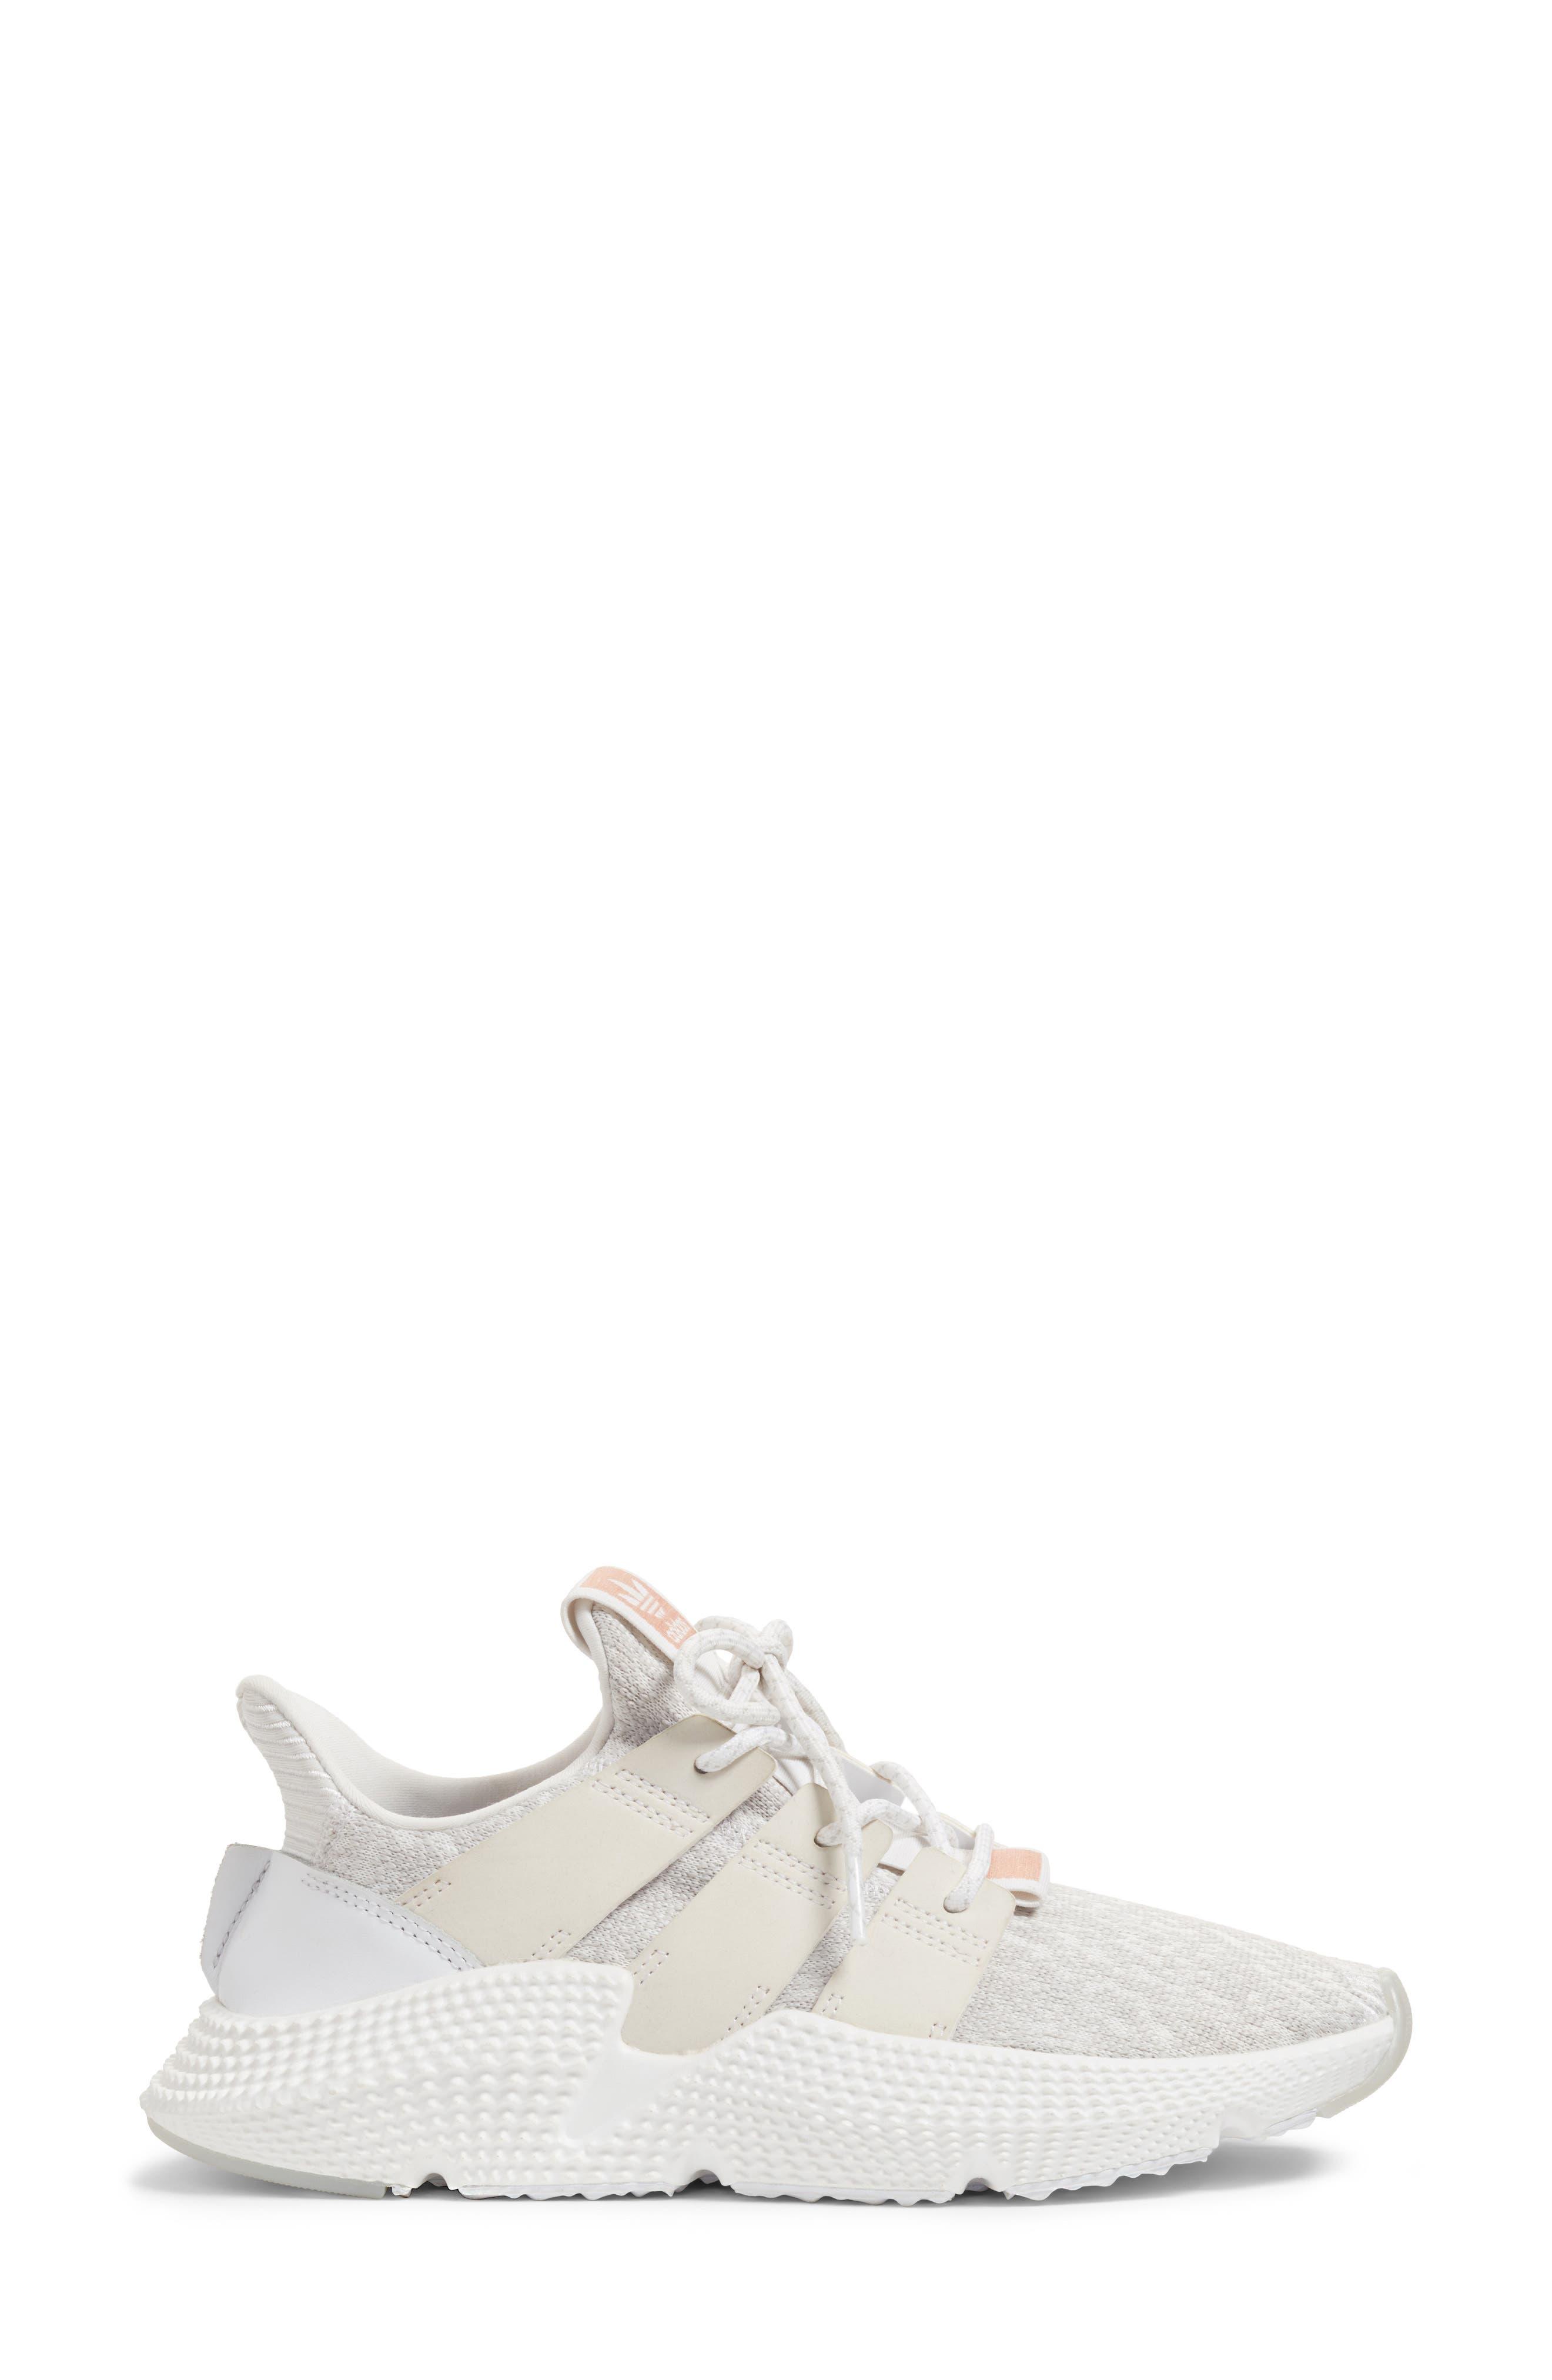 Prophere Sneaker,                             Alternate thumbnail 3, color,                             White/ White/ Supplier Colour